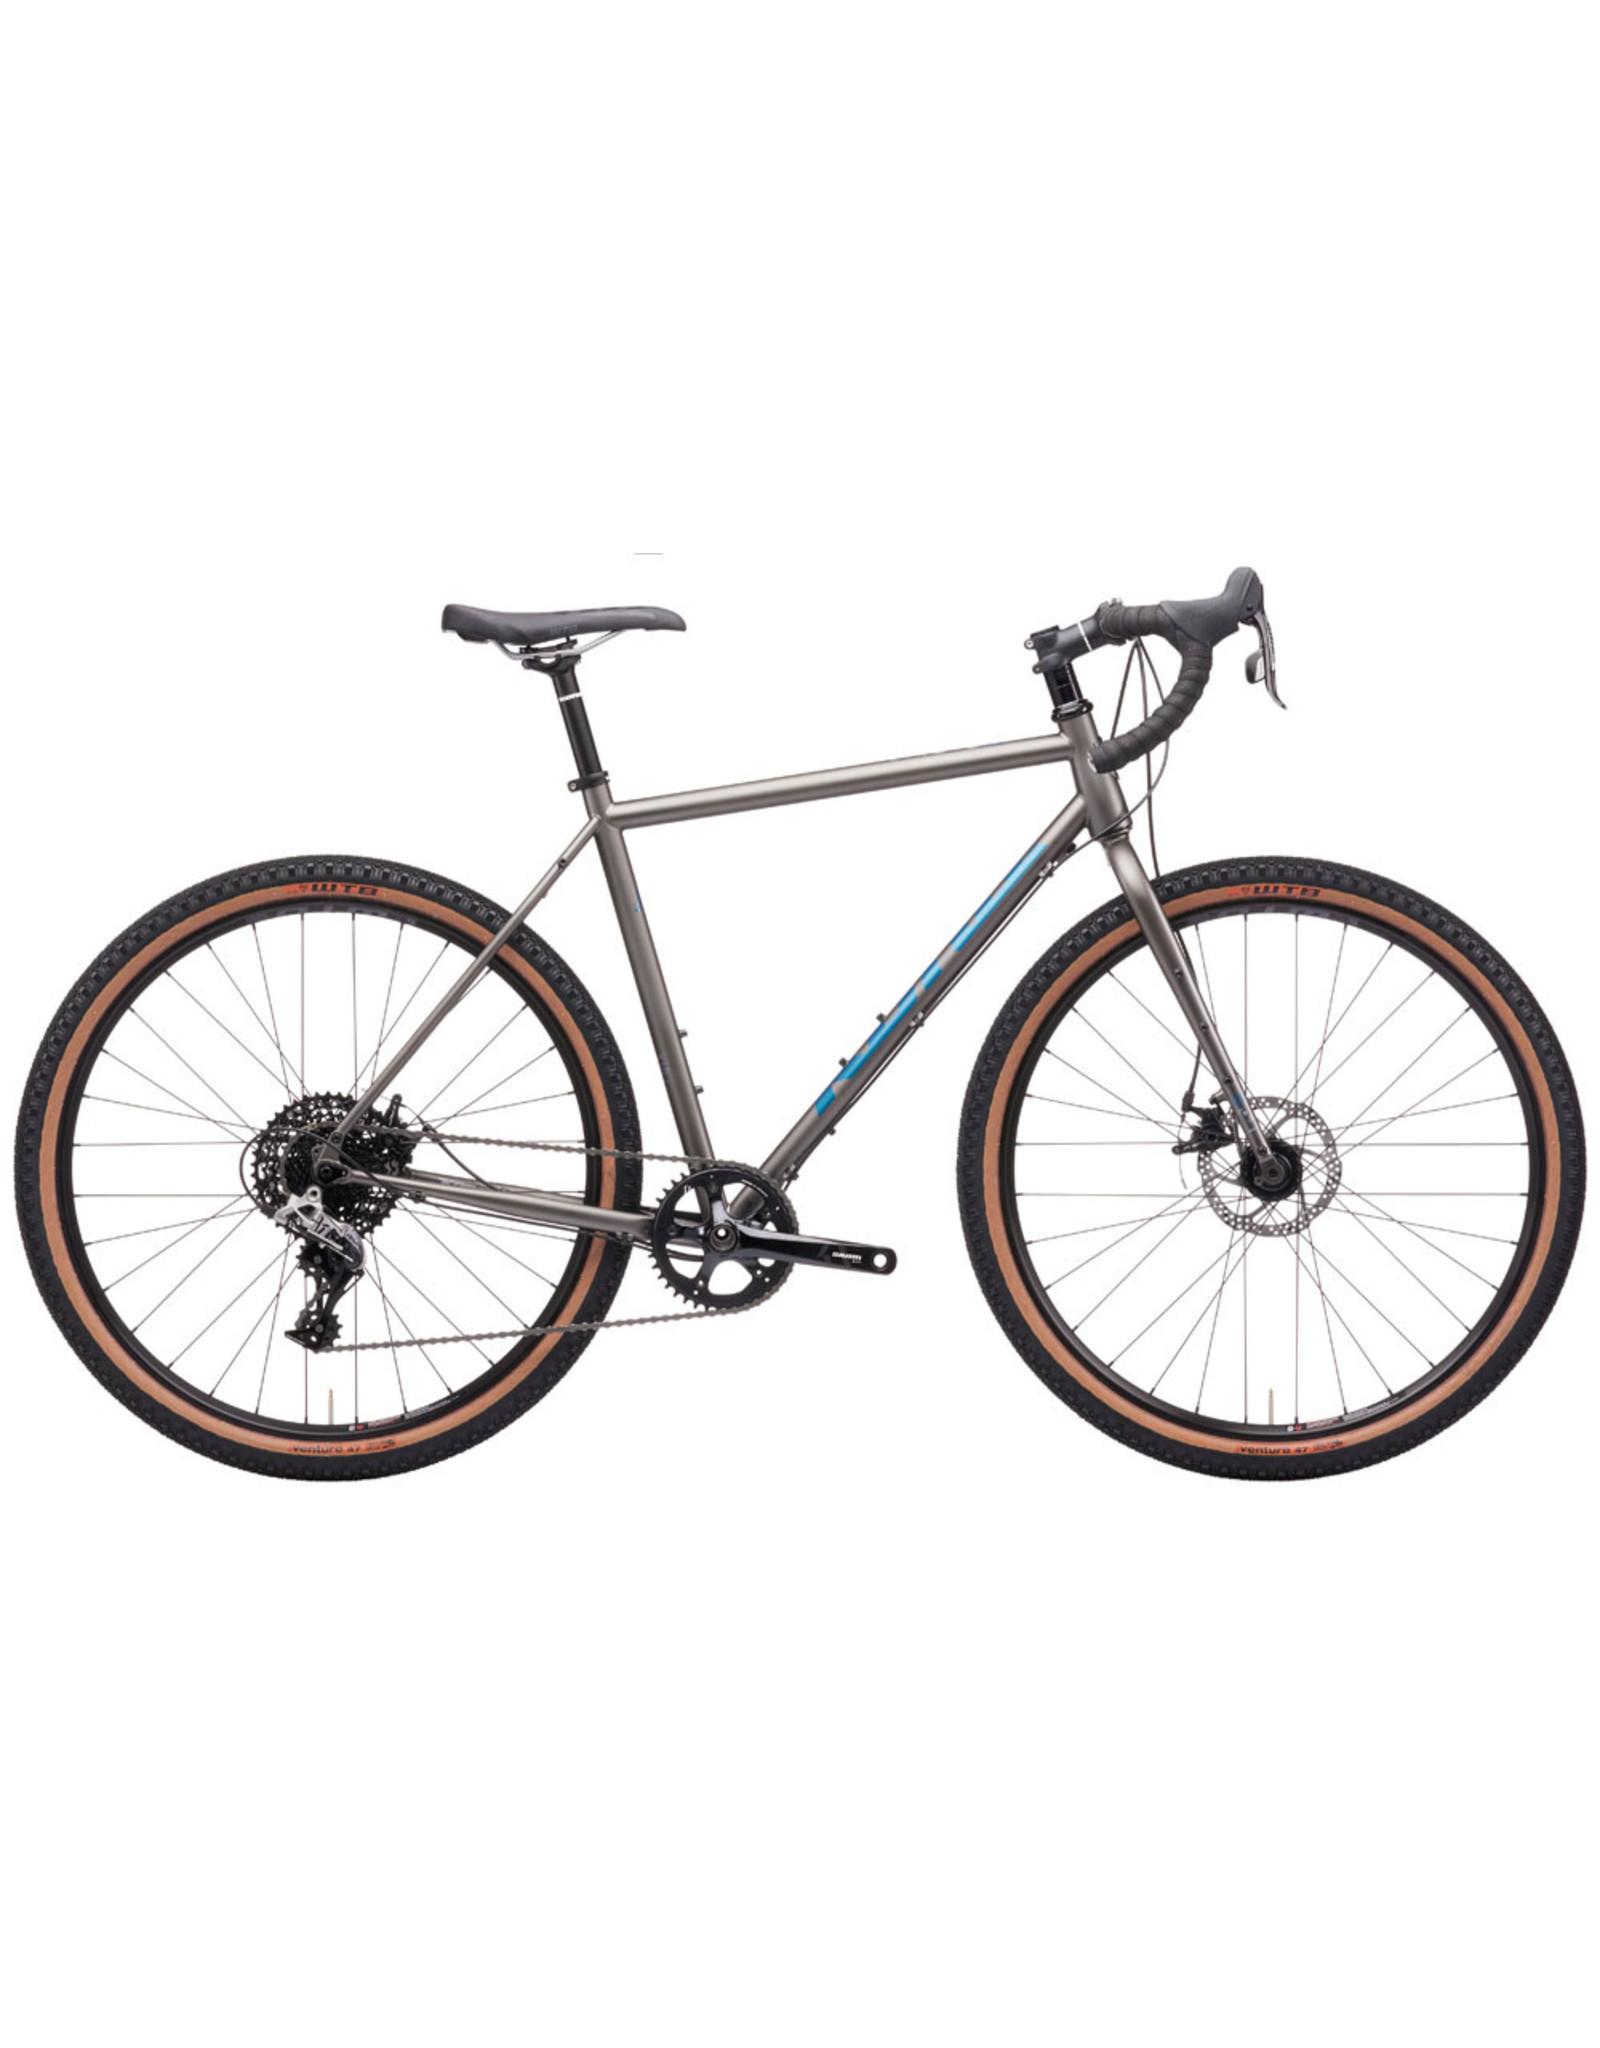 Kona Kona Rove DL 58cm Gray 2021